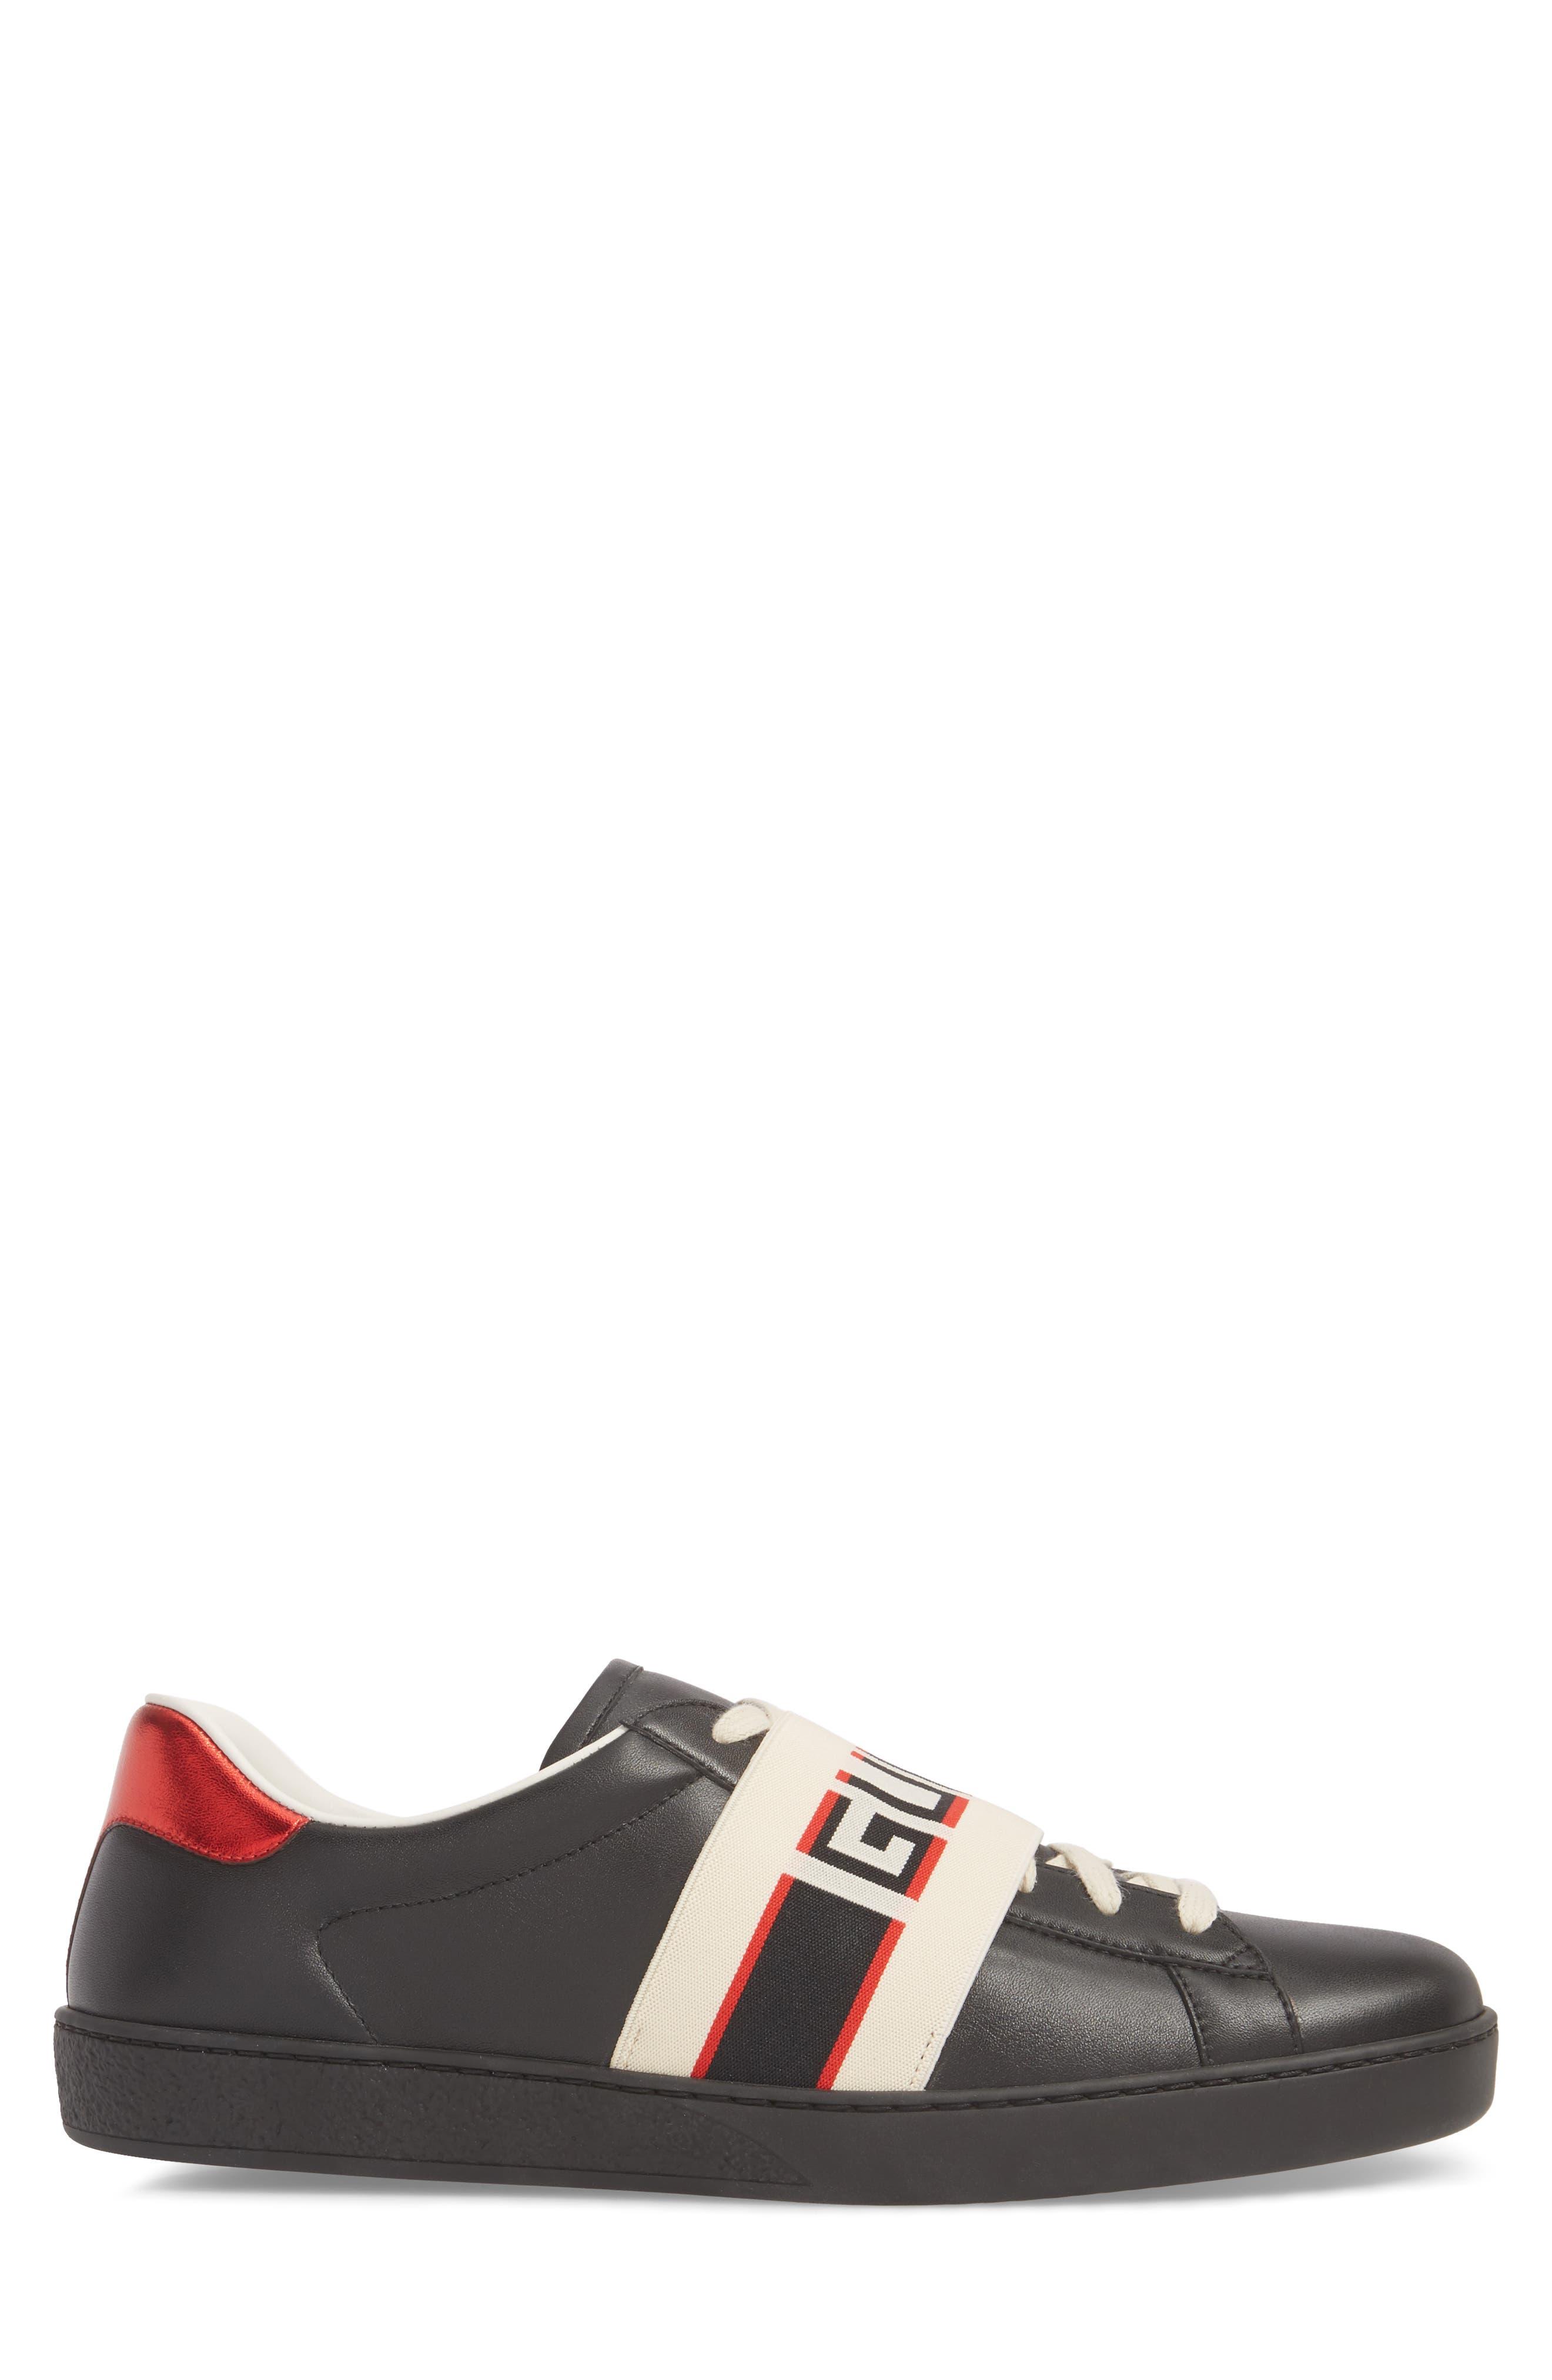 GUCCI, New Ace Stripe Leather Sneaker, Alternate thumbnail 3, color, BLACK